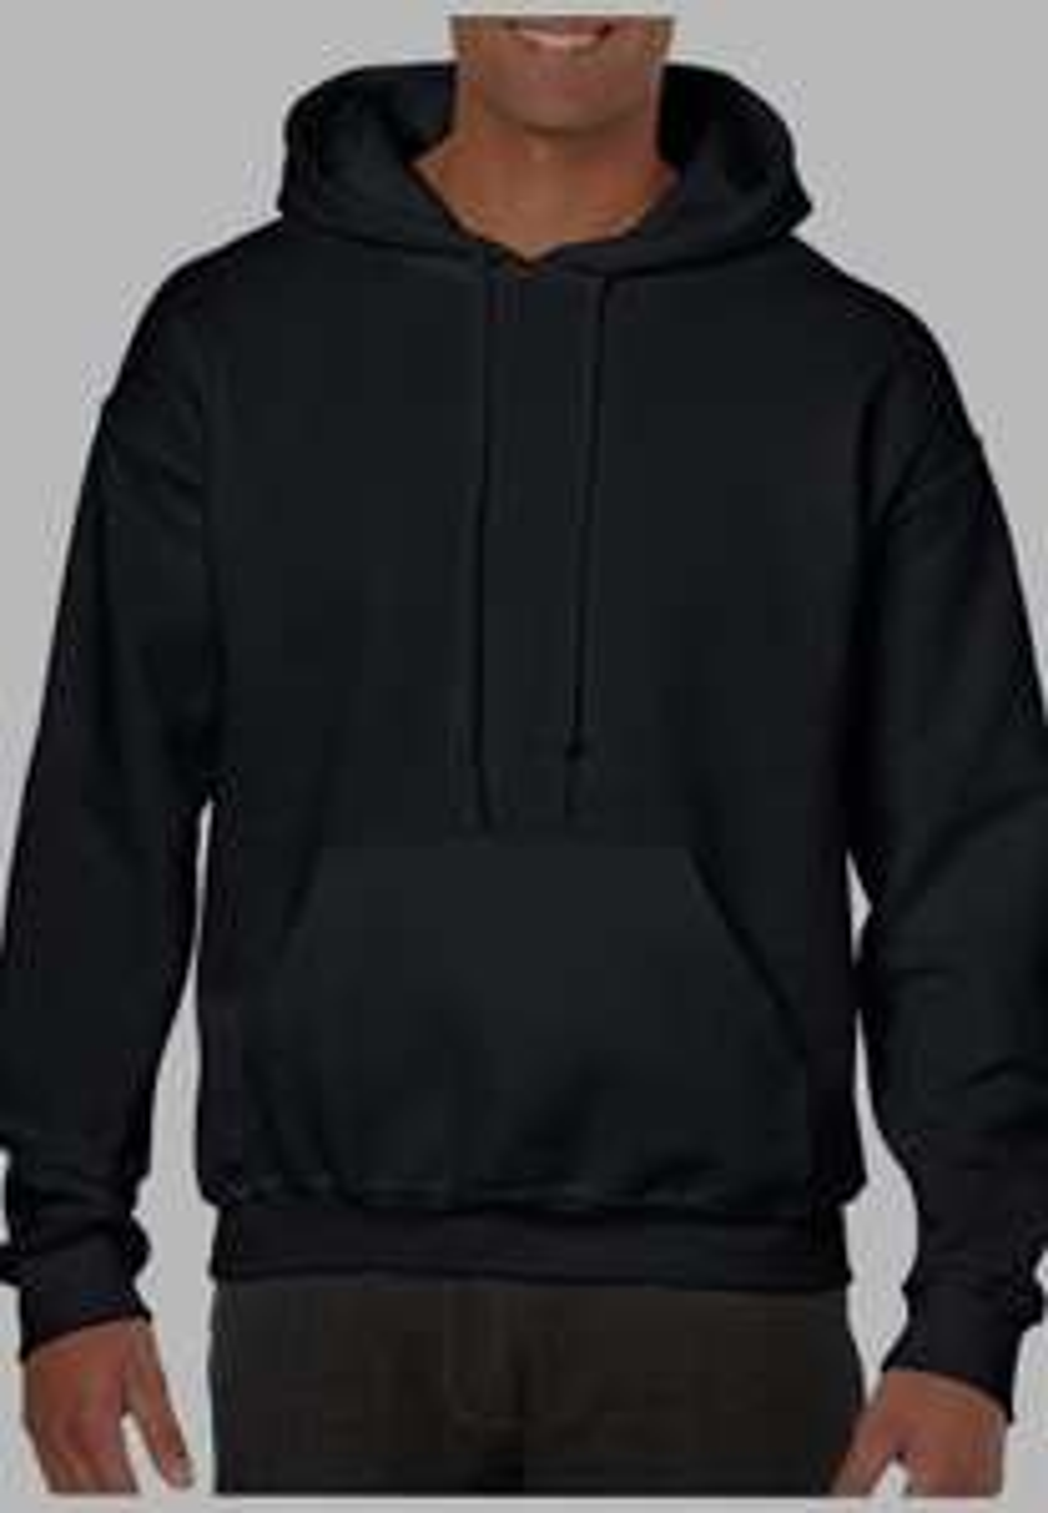 Amazon: Gildan Heavy Blend G18500 - Sudadera con Capucha Camisa para Hombre